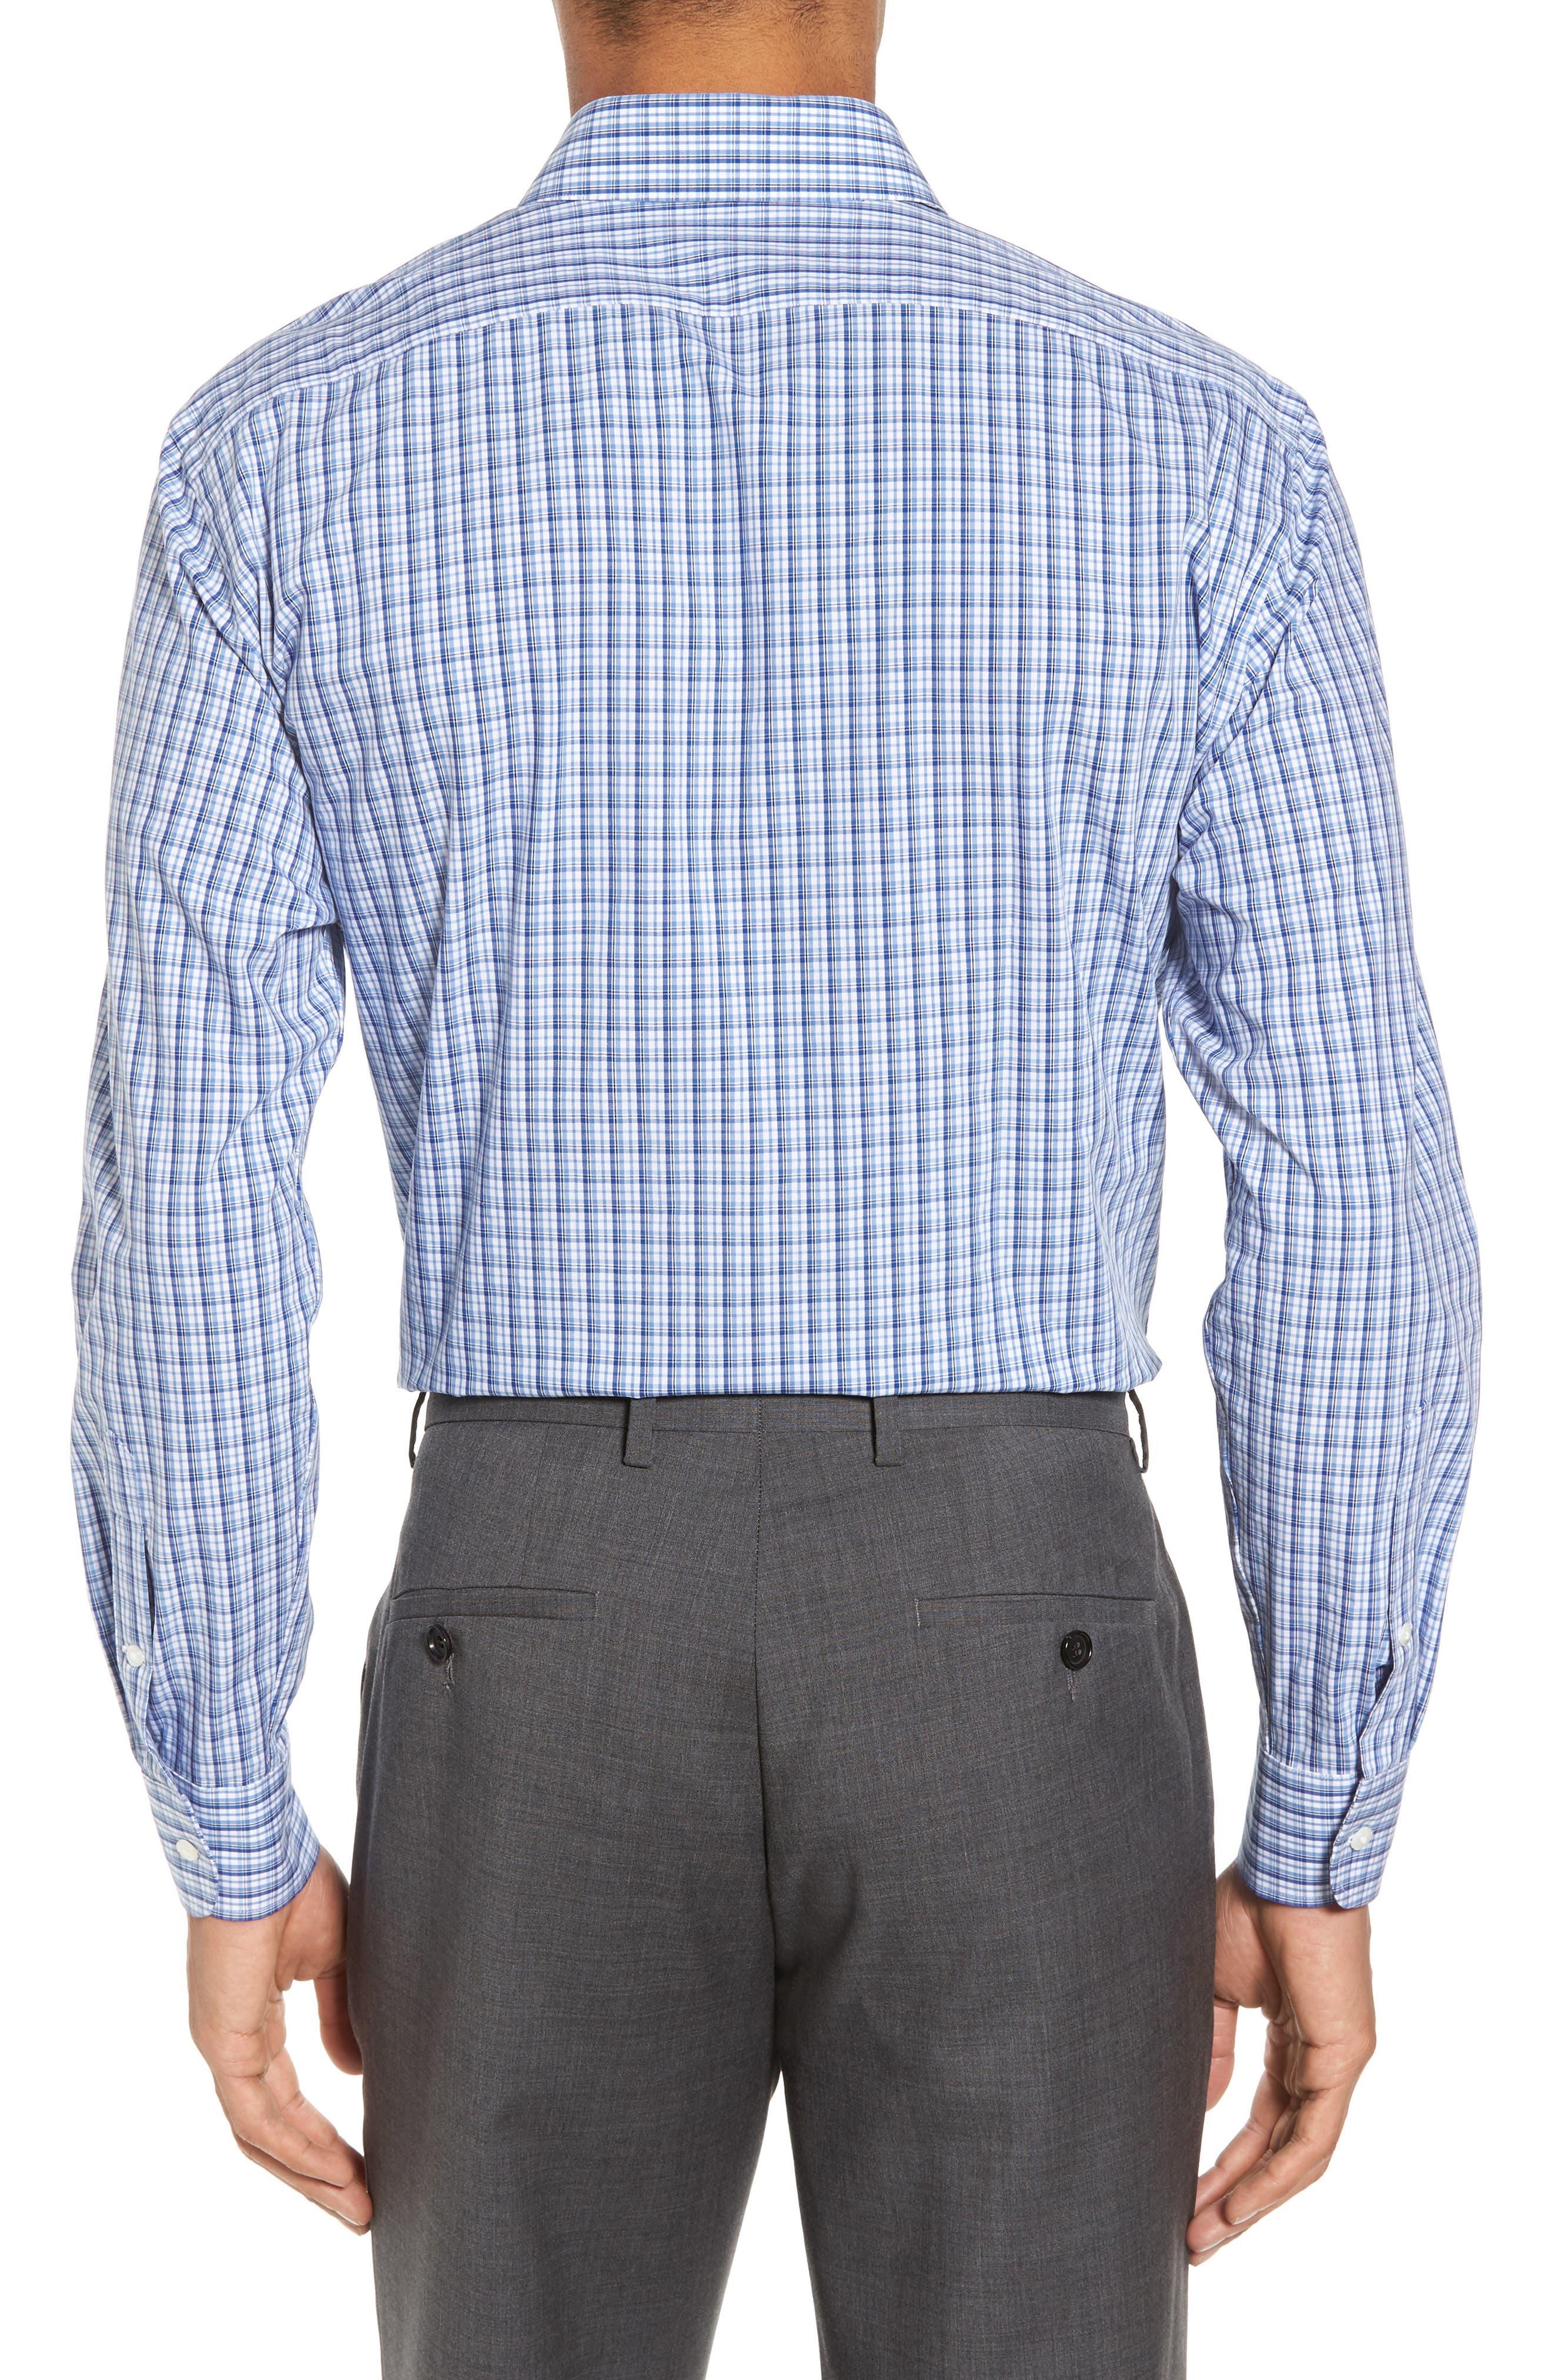 Alternate Image 2  - Nordstrom Men's Shop Tech-Smart Trim Fit Stretch Plaid Dress Shirt